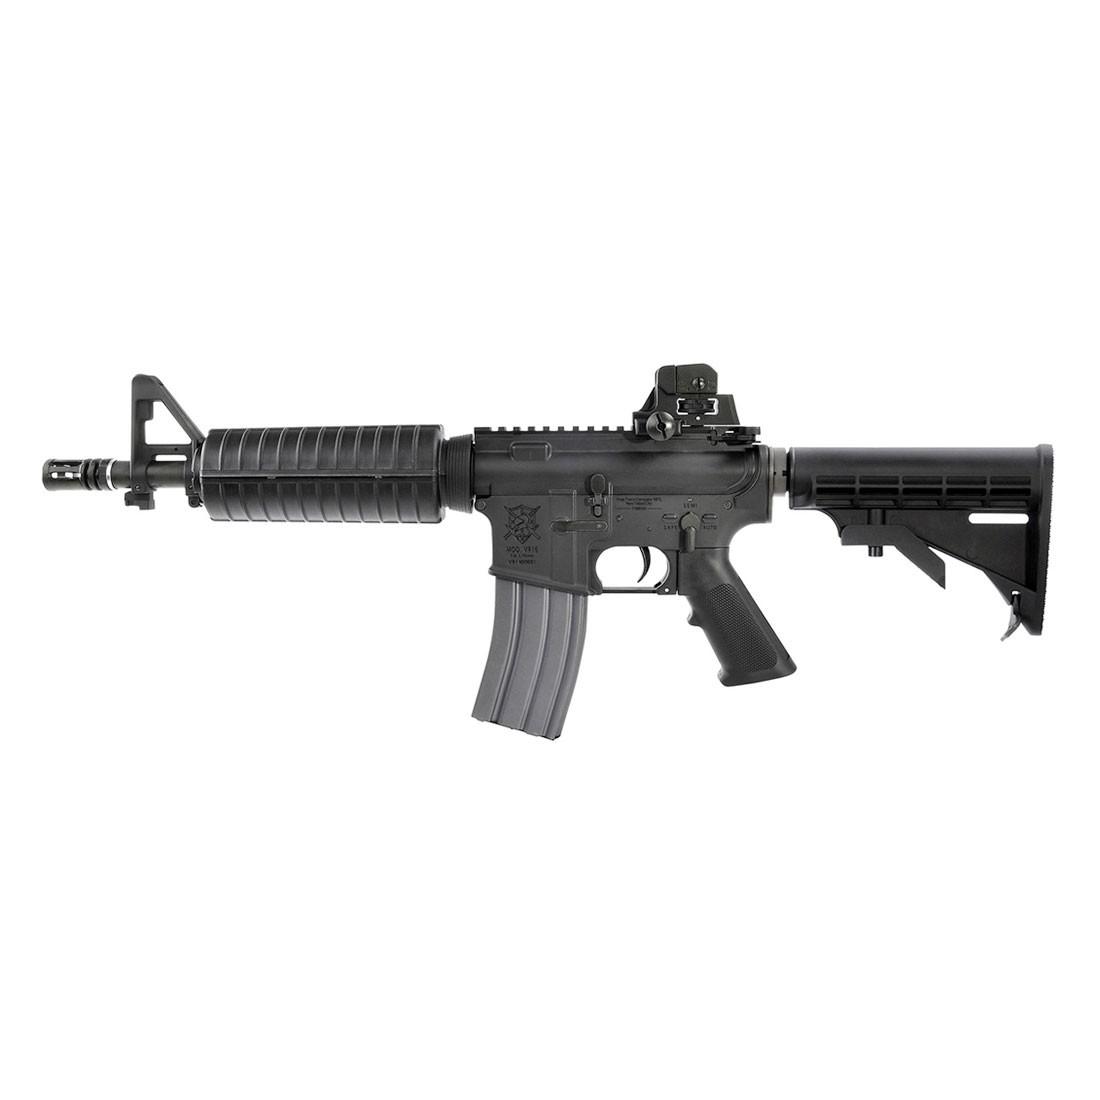 VFC VR16 M105 M4 AEG Black